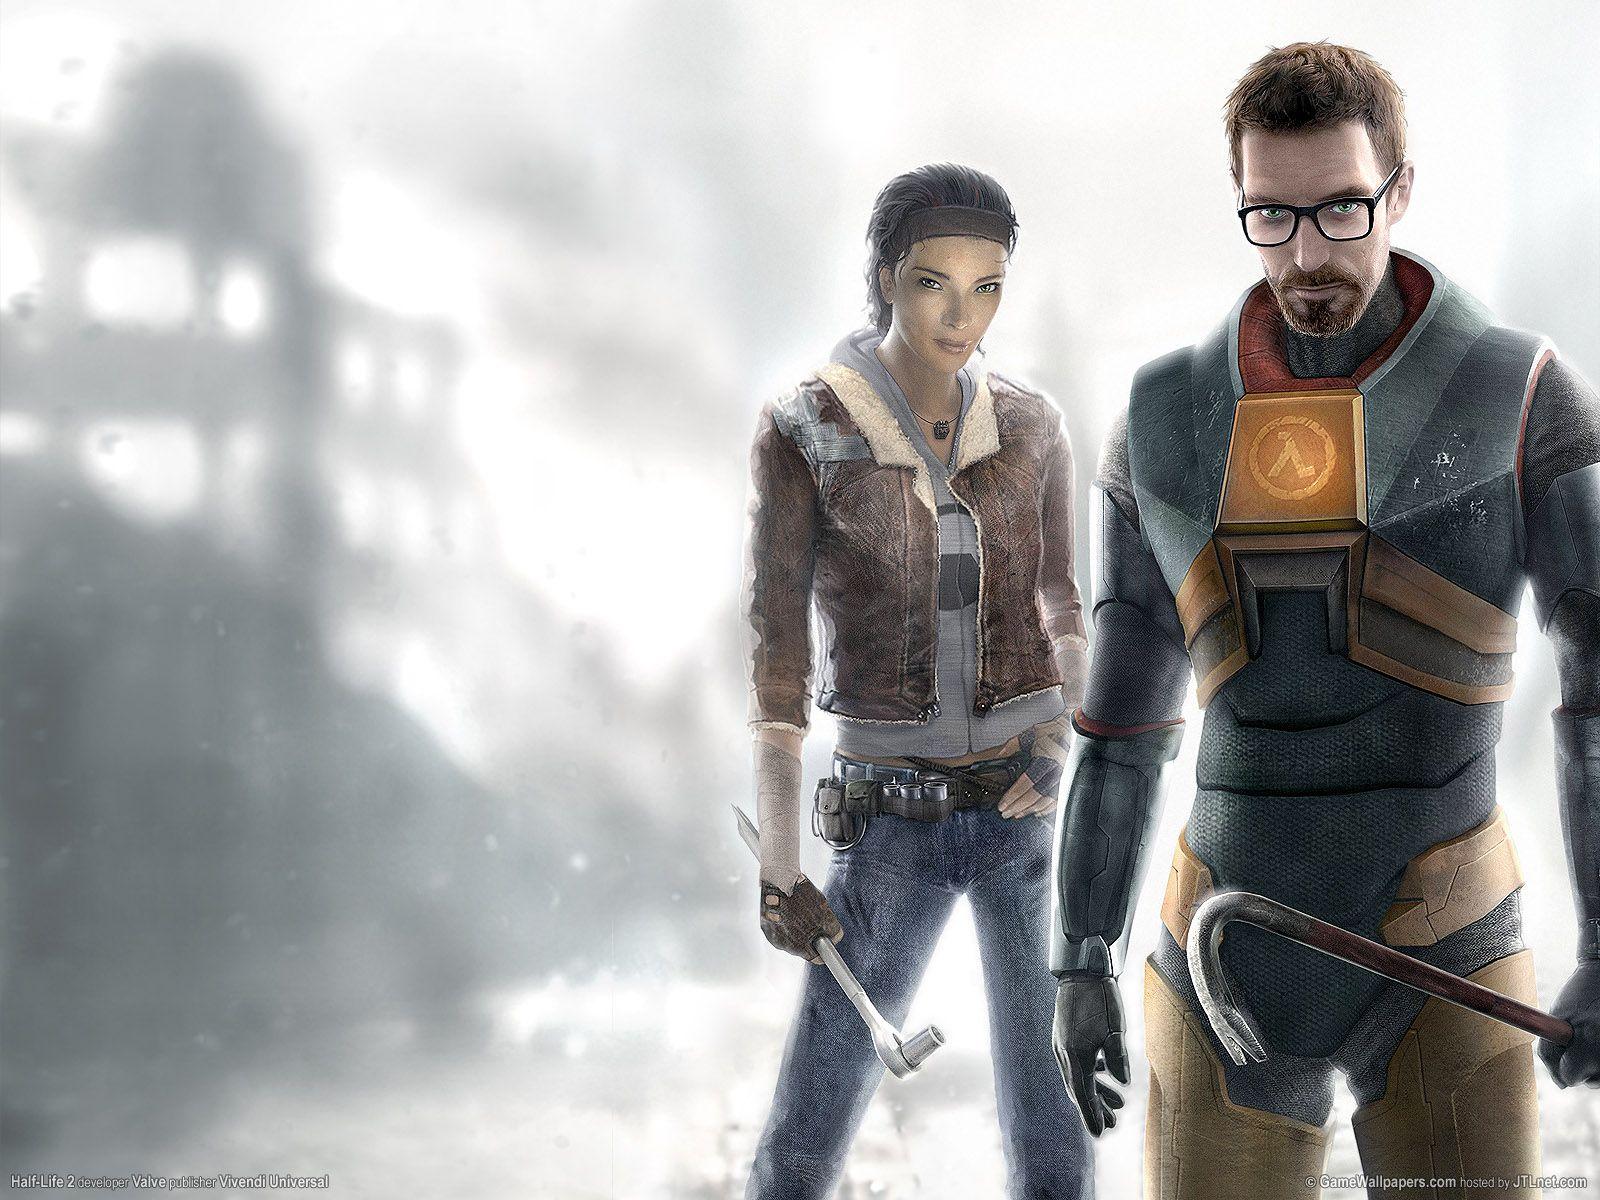 Game Half Life 2 03 1600x1200 Jpg 1600 1200 Half Life Gordon Freeman Freeman